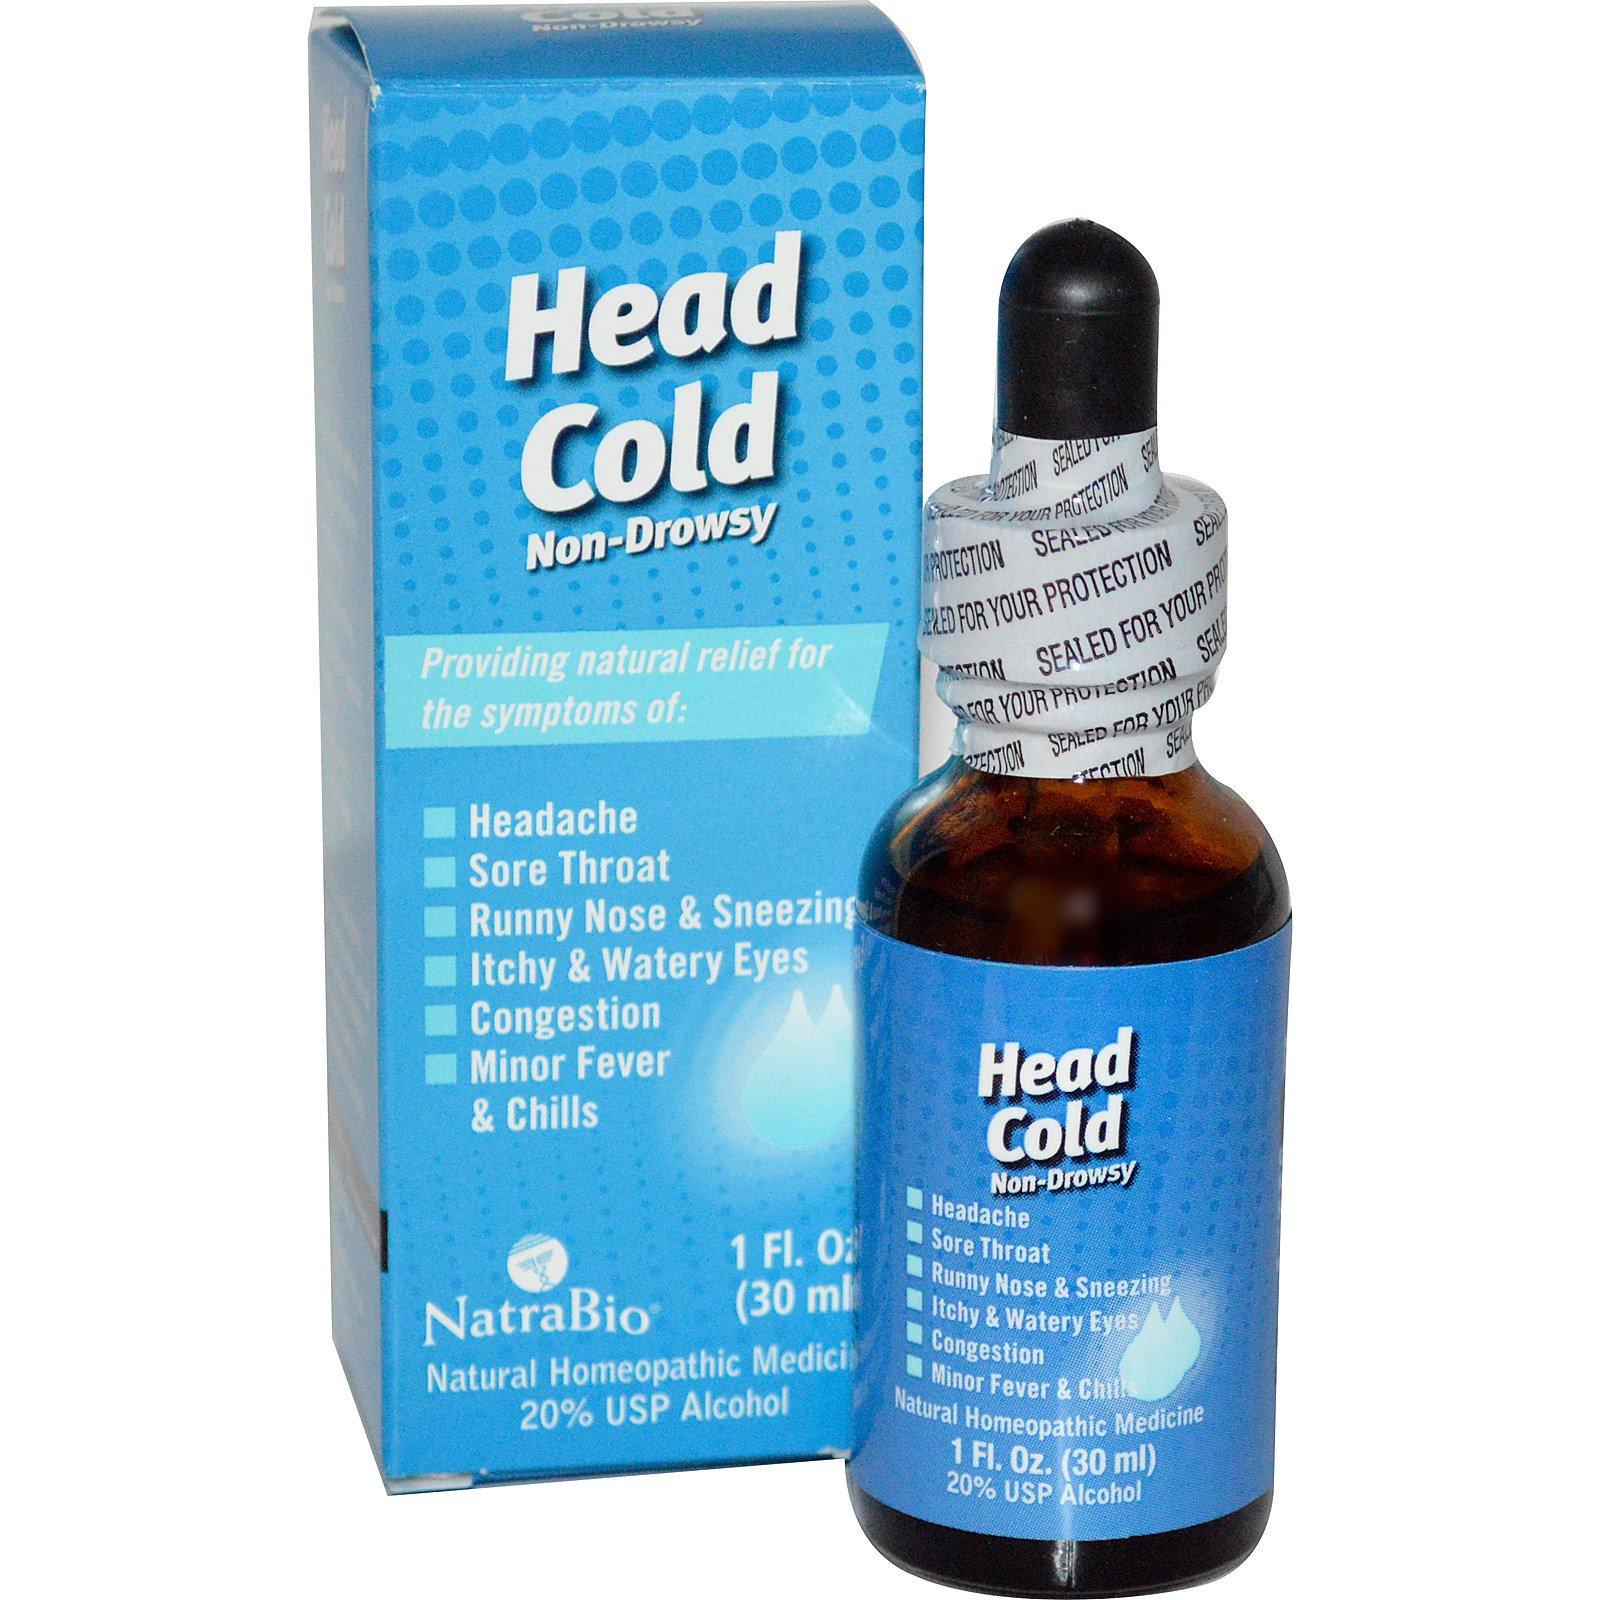 NatraBio Head Cold 1 fl oz 30 ml iHerb